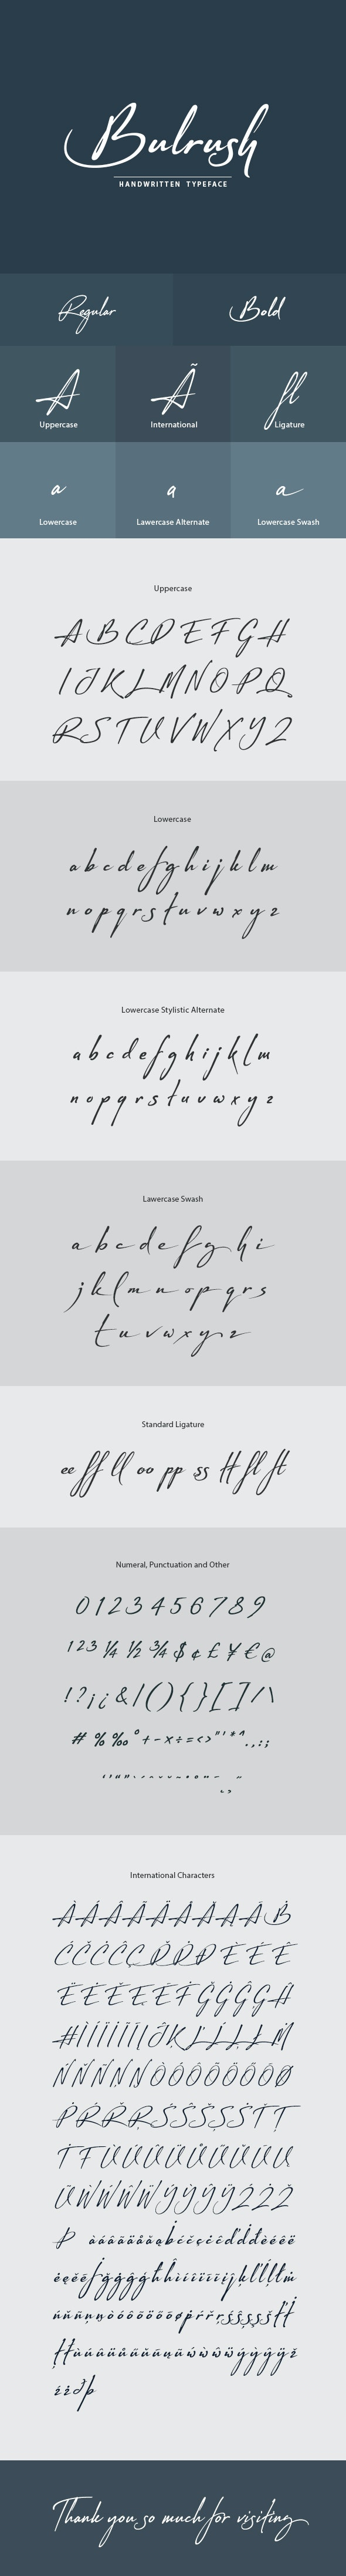 Bulrush Handwritten Font - Hand-writing Script